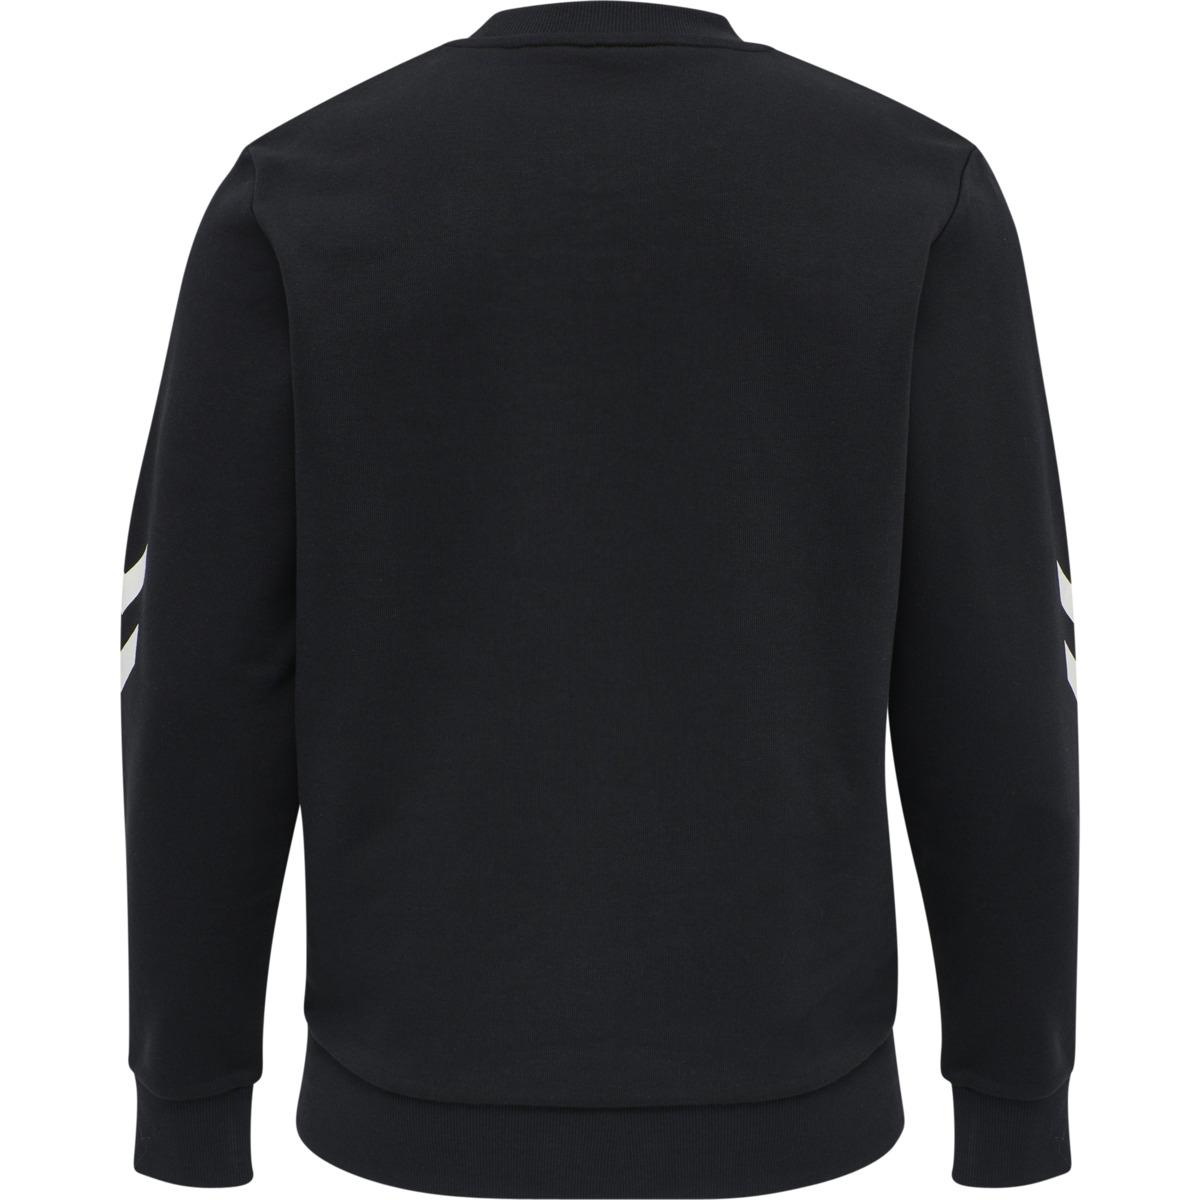 Hummel hmlLGC Graham sweatshirt, black, medium